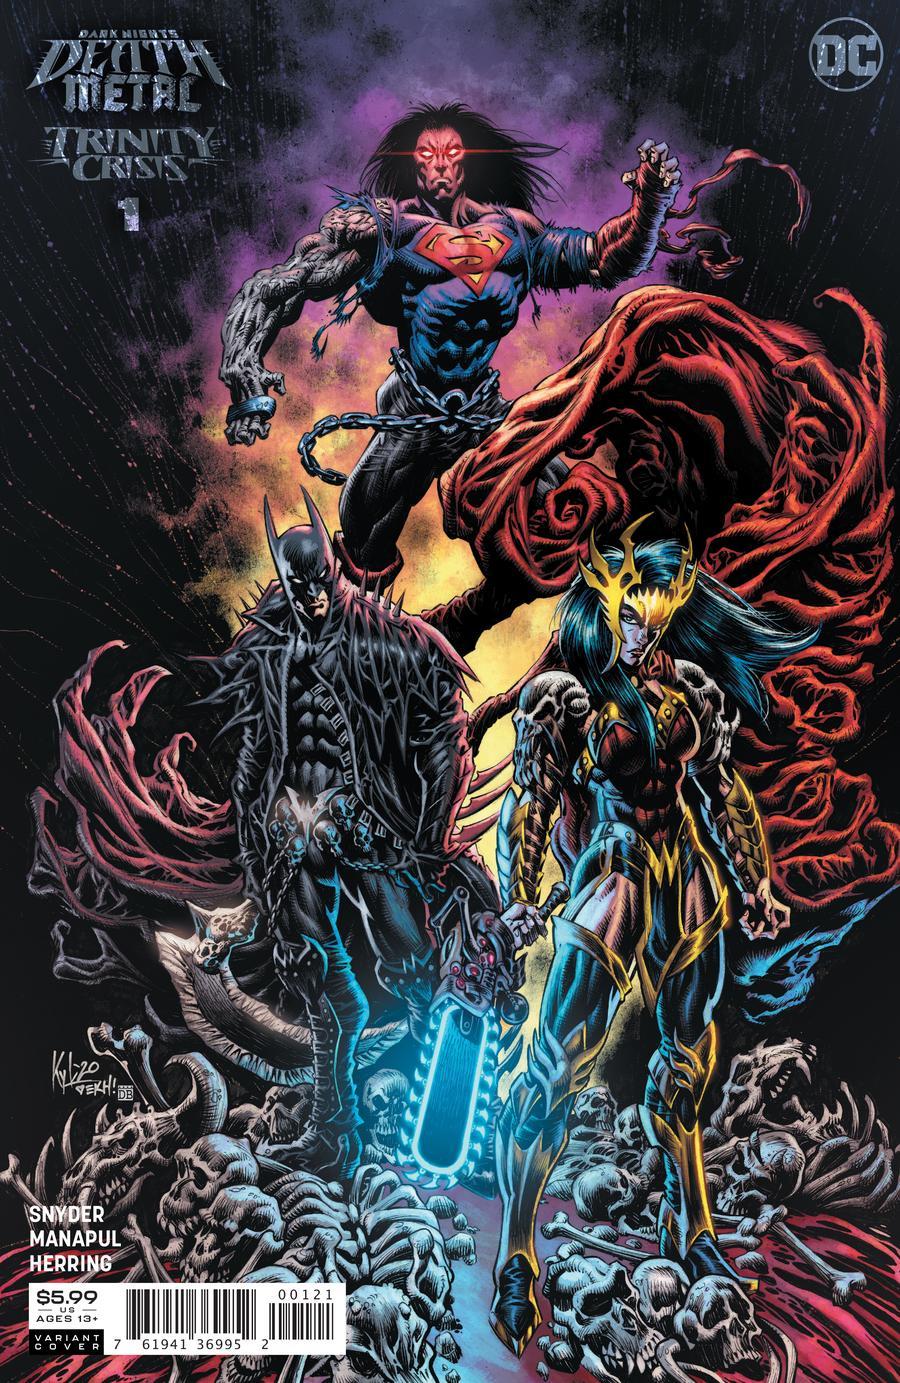 Dark Nights Death Metal Trinity Crisis #1 Cover B 1:25 Kyle Hotz Variant